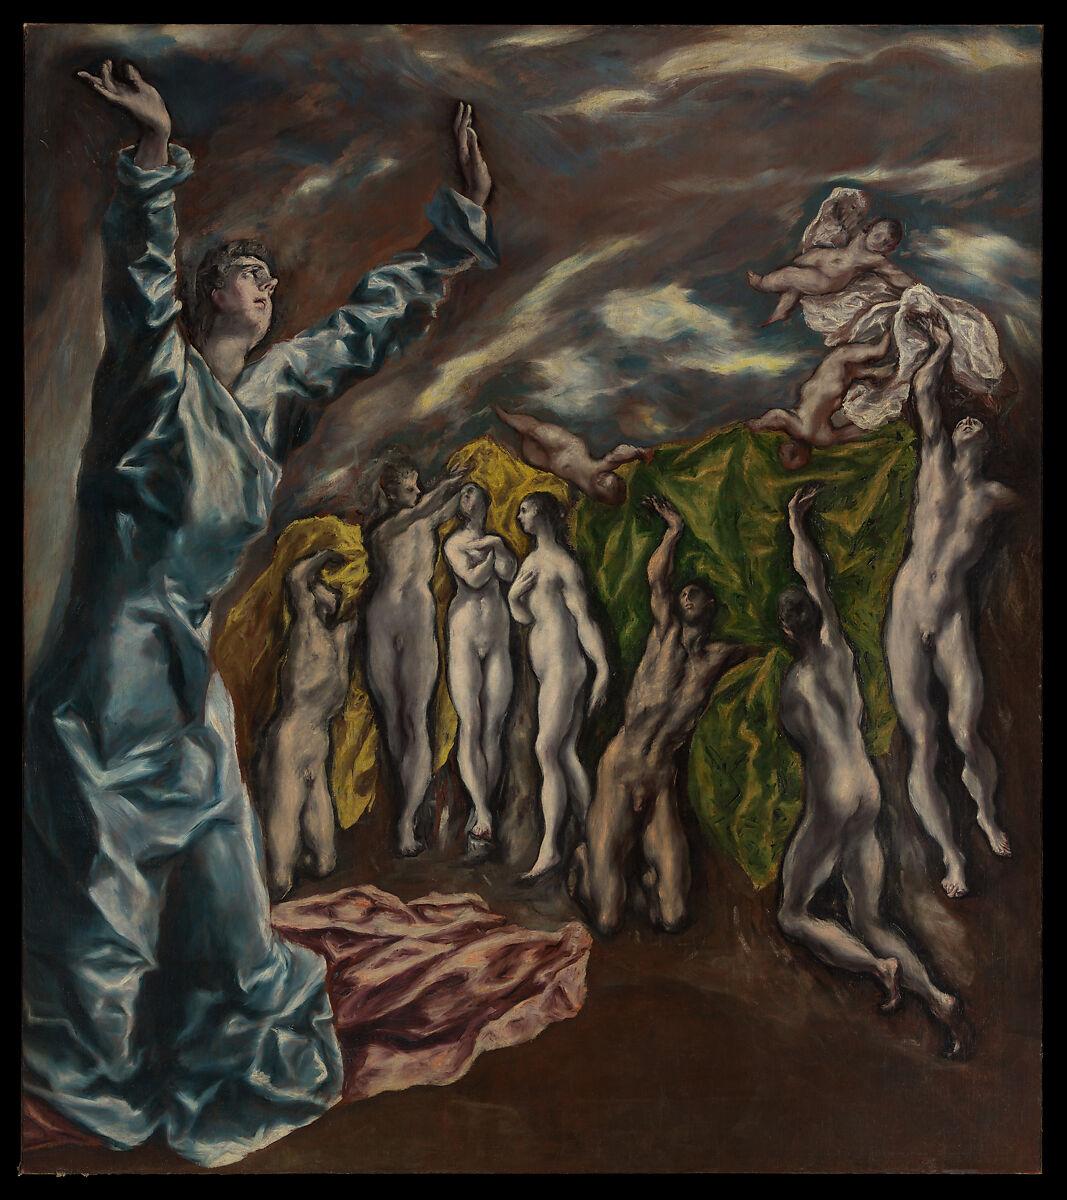 The Vision of Saint John, El Greco (Domenikos Theotokopoulos) (Greek, Iráklion (Candia) 1541–1614 Toledo), Oil on canvas